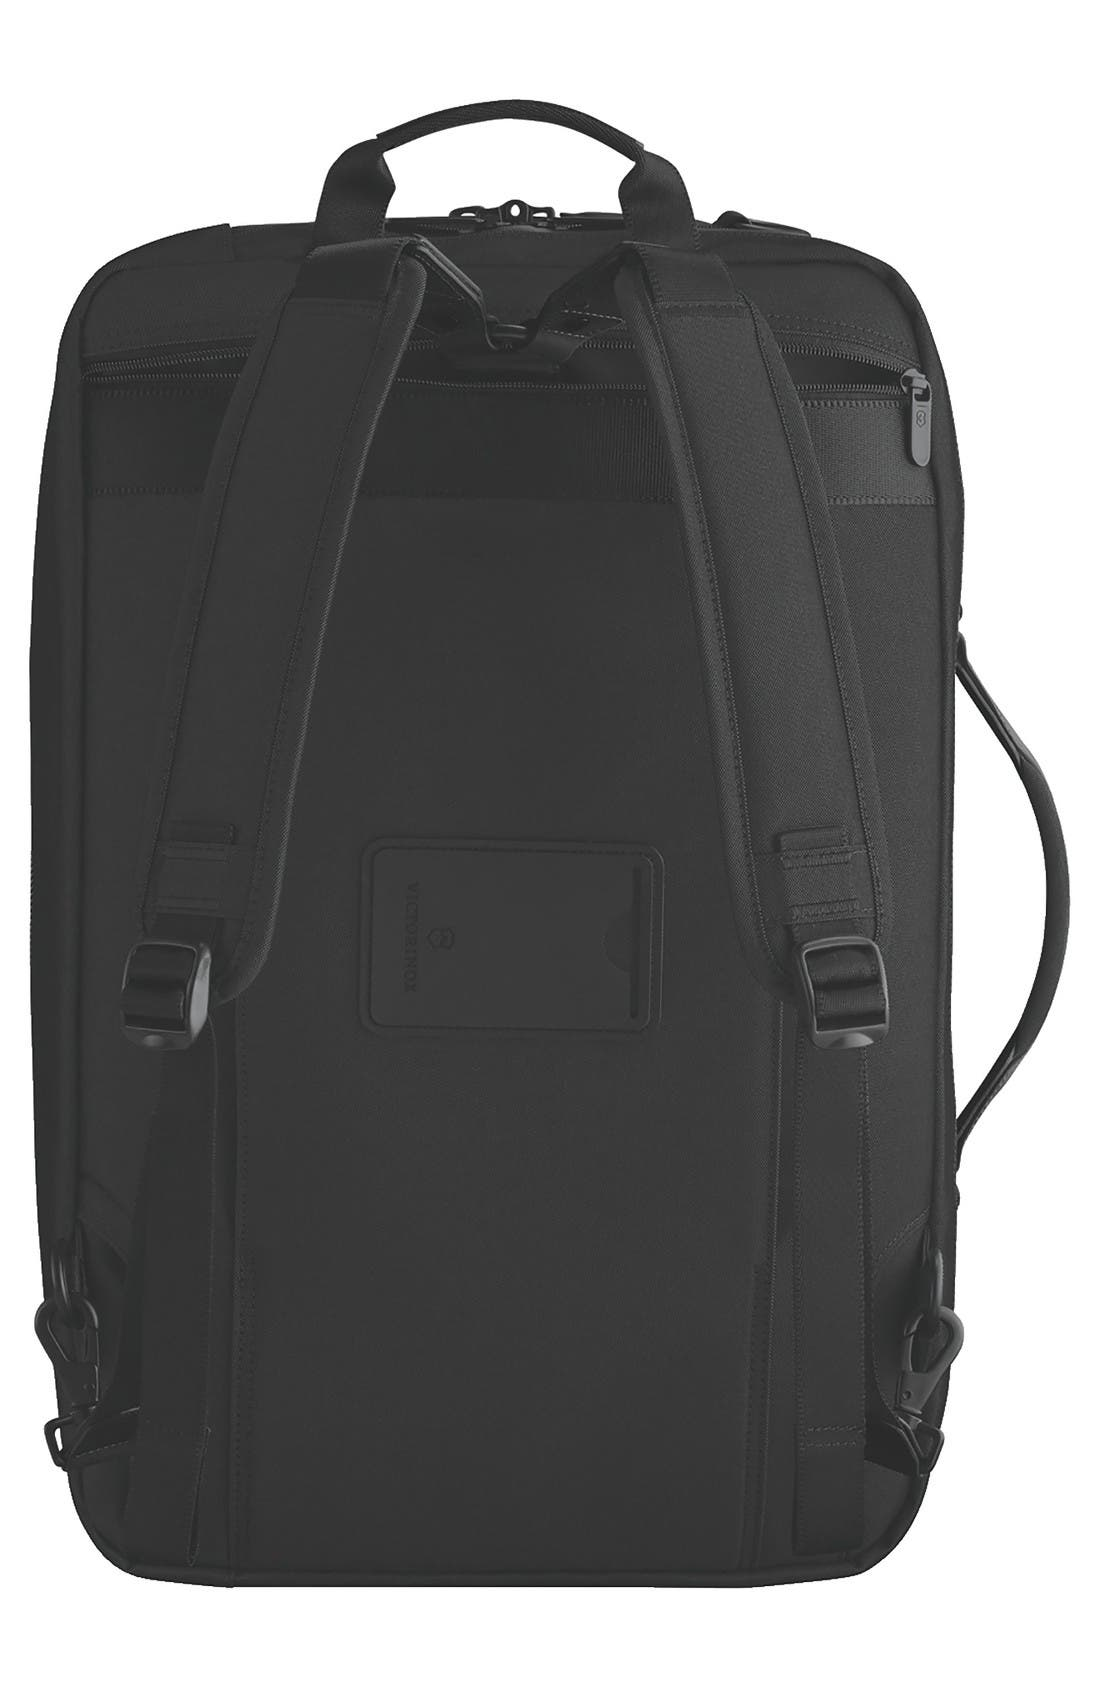 Lexicon 2.0 Convertible Backpack,                             Alternate thumbnail 4, color,                             Black